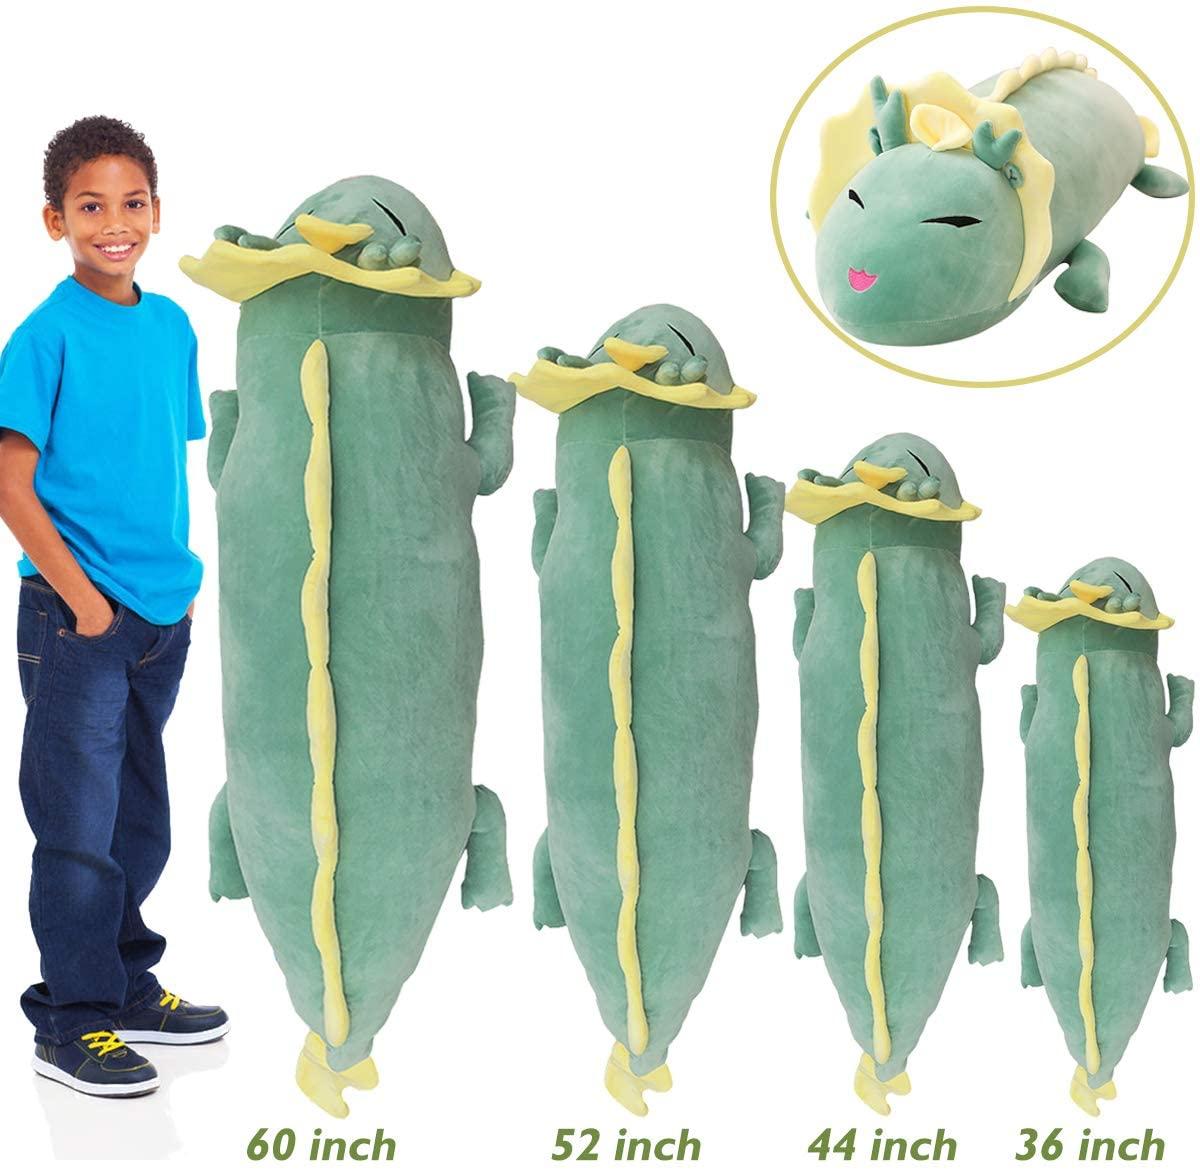 Hofun4U Dragon Plush Pillow, Dragon Stuffed Animals Doll Toy, Soft Giant Dragon Pillow Home Decoration Christmas Birthday Gift for Adults Kids Girls Boys (36/44/52/60 Inches,3 Colors)